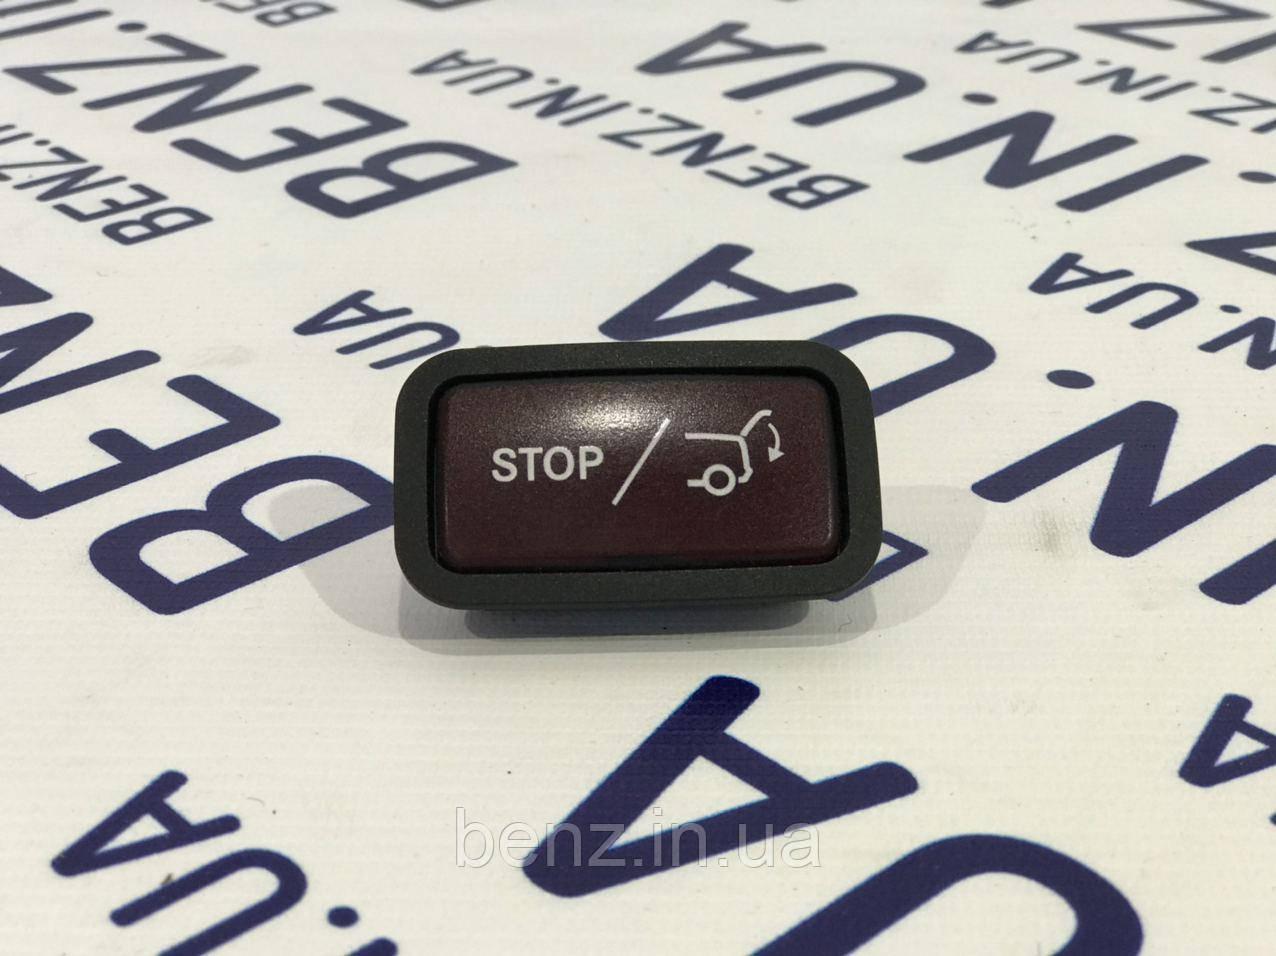 Кнопка элекроподъмника кришки багажника W212 рестайл A2128210651